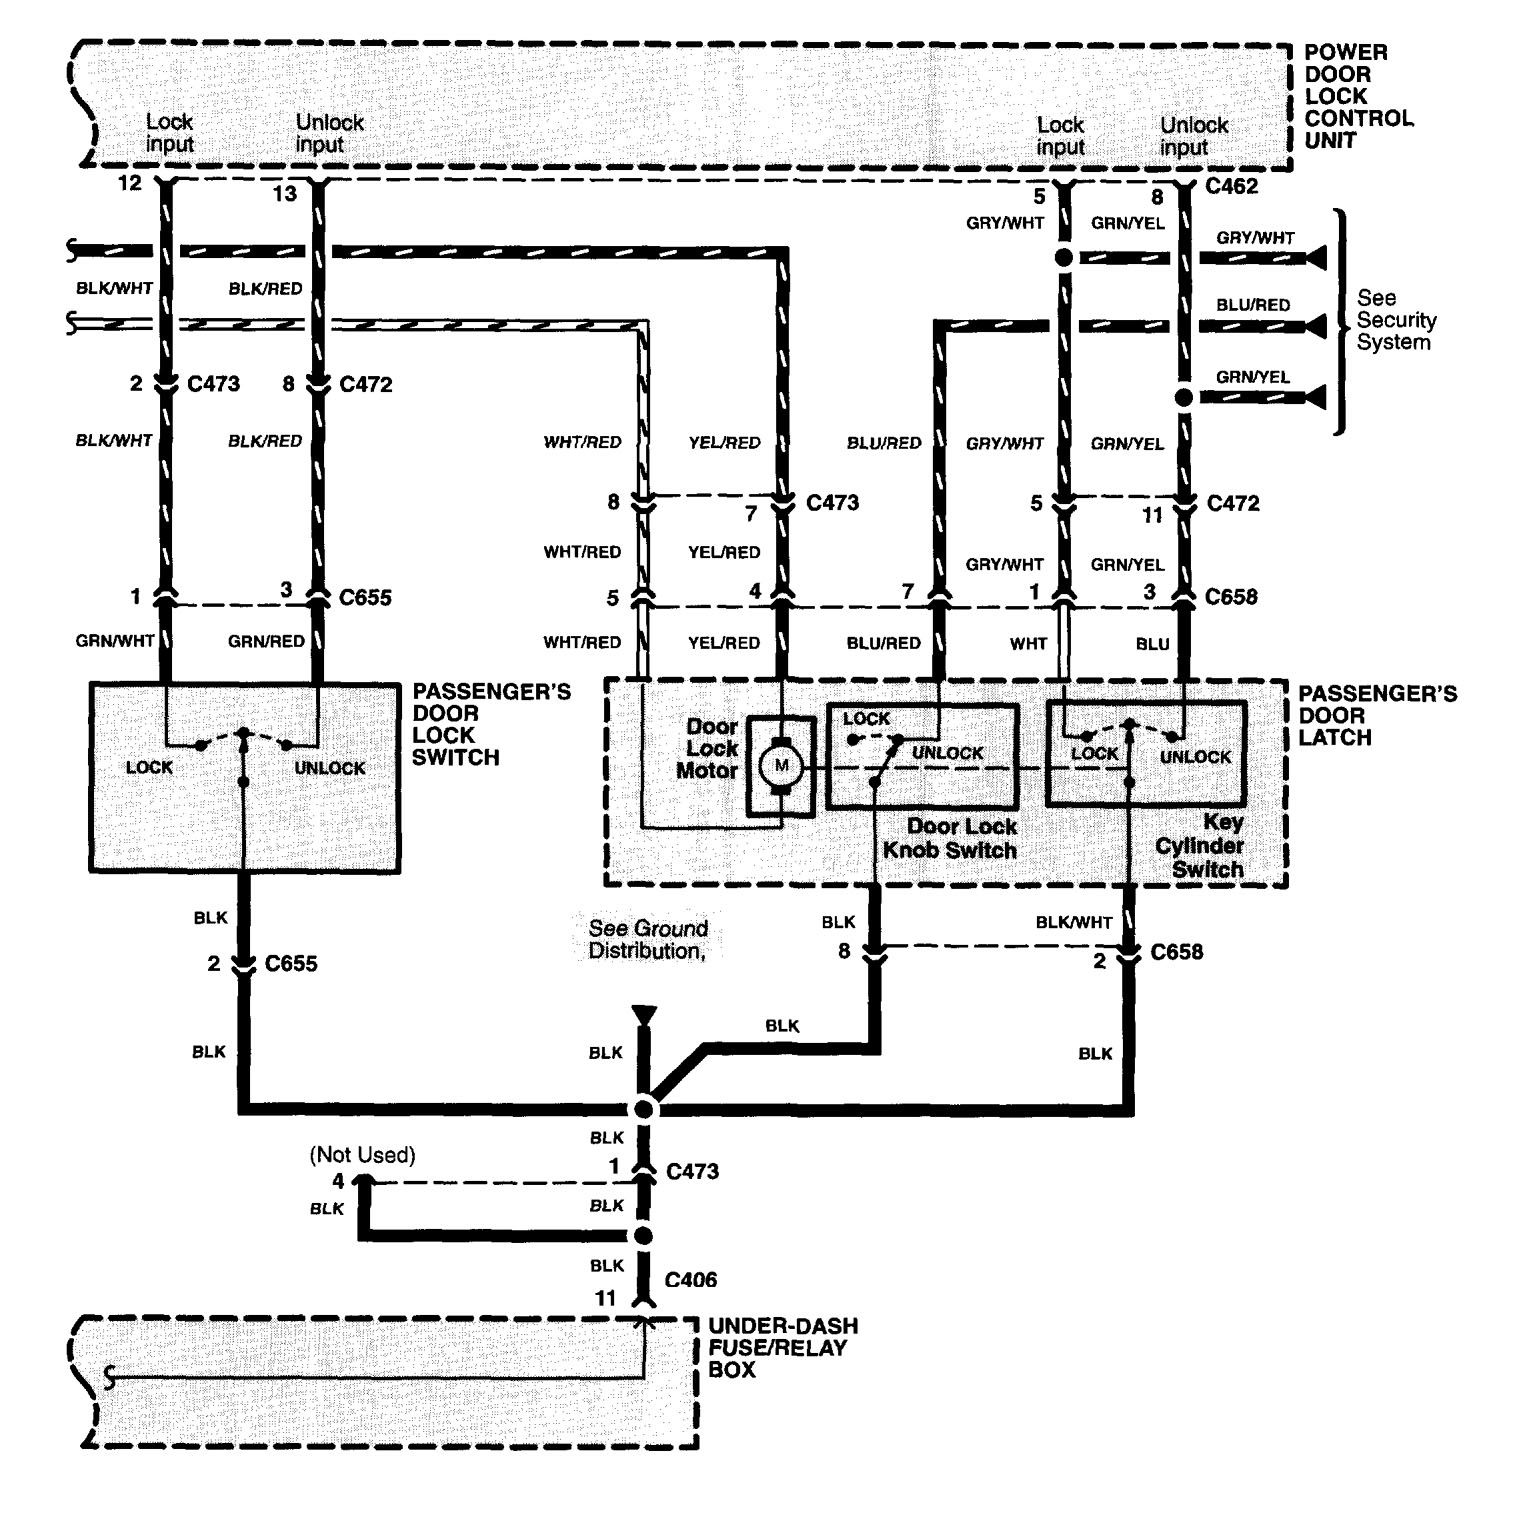 Acura Mdx Wiring Diagram